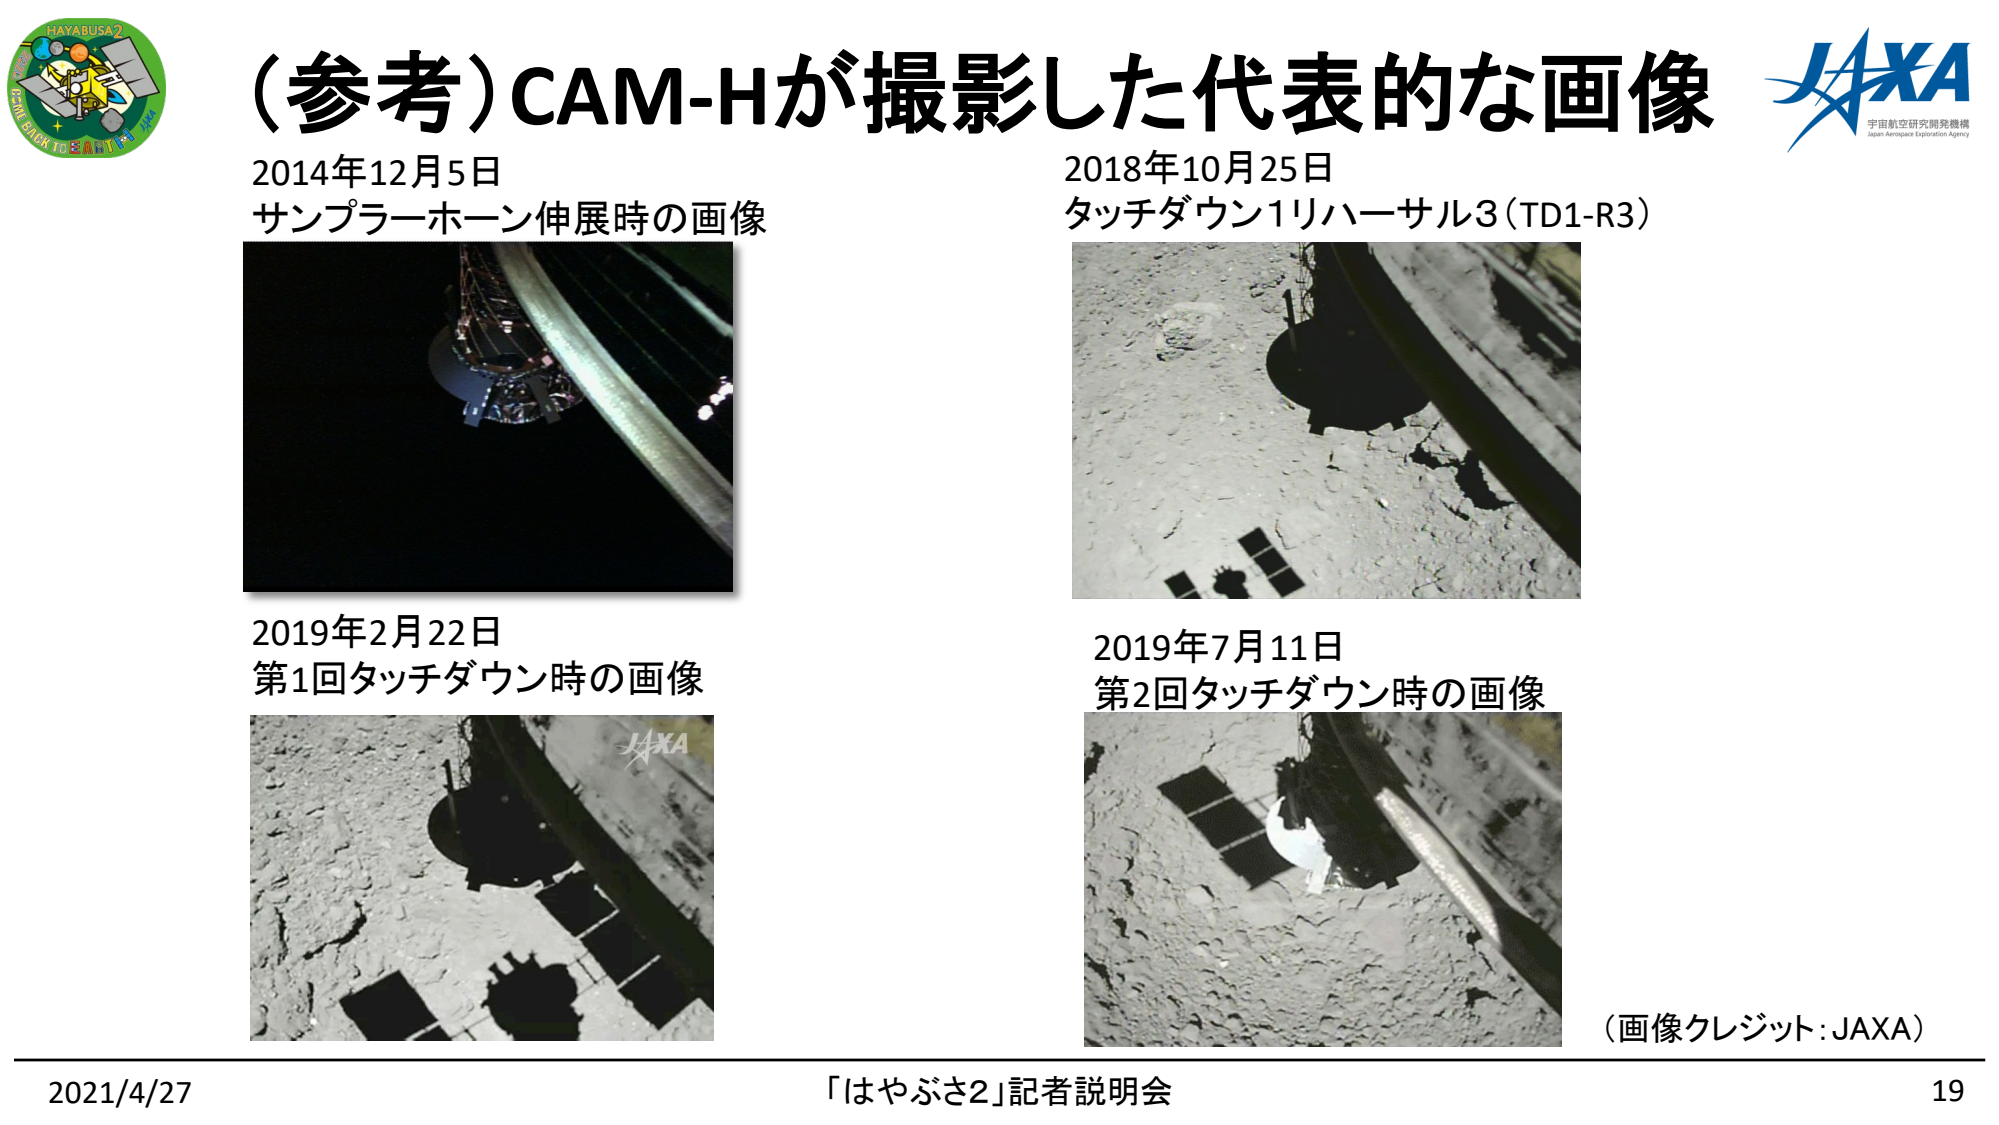 f:id:Imamura:20210427135300p:plain